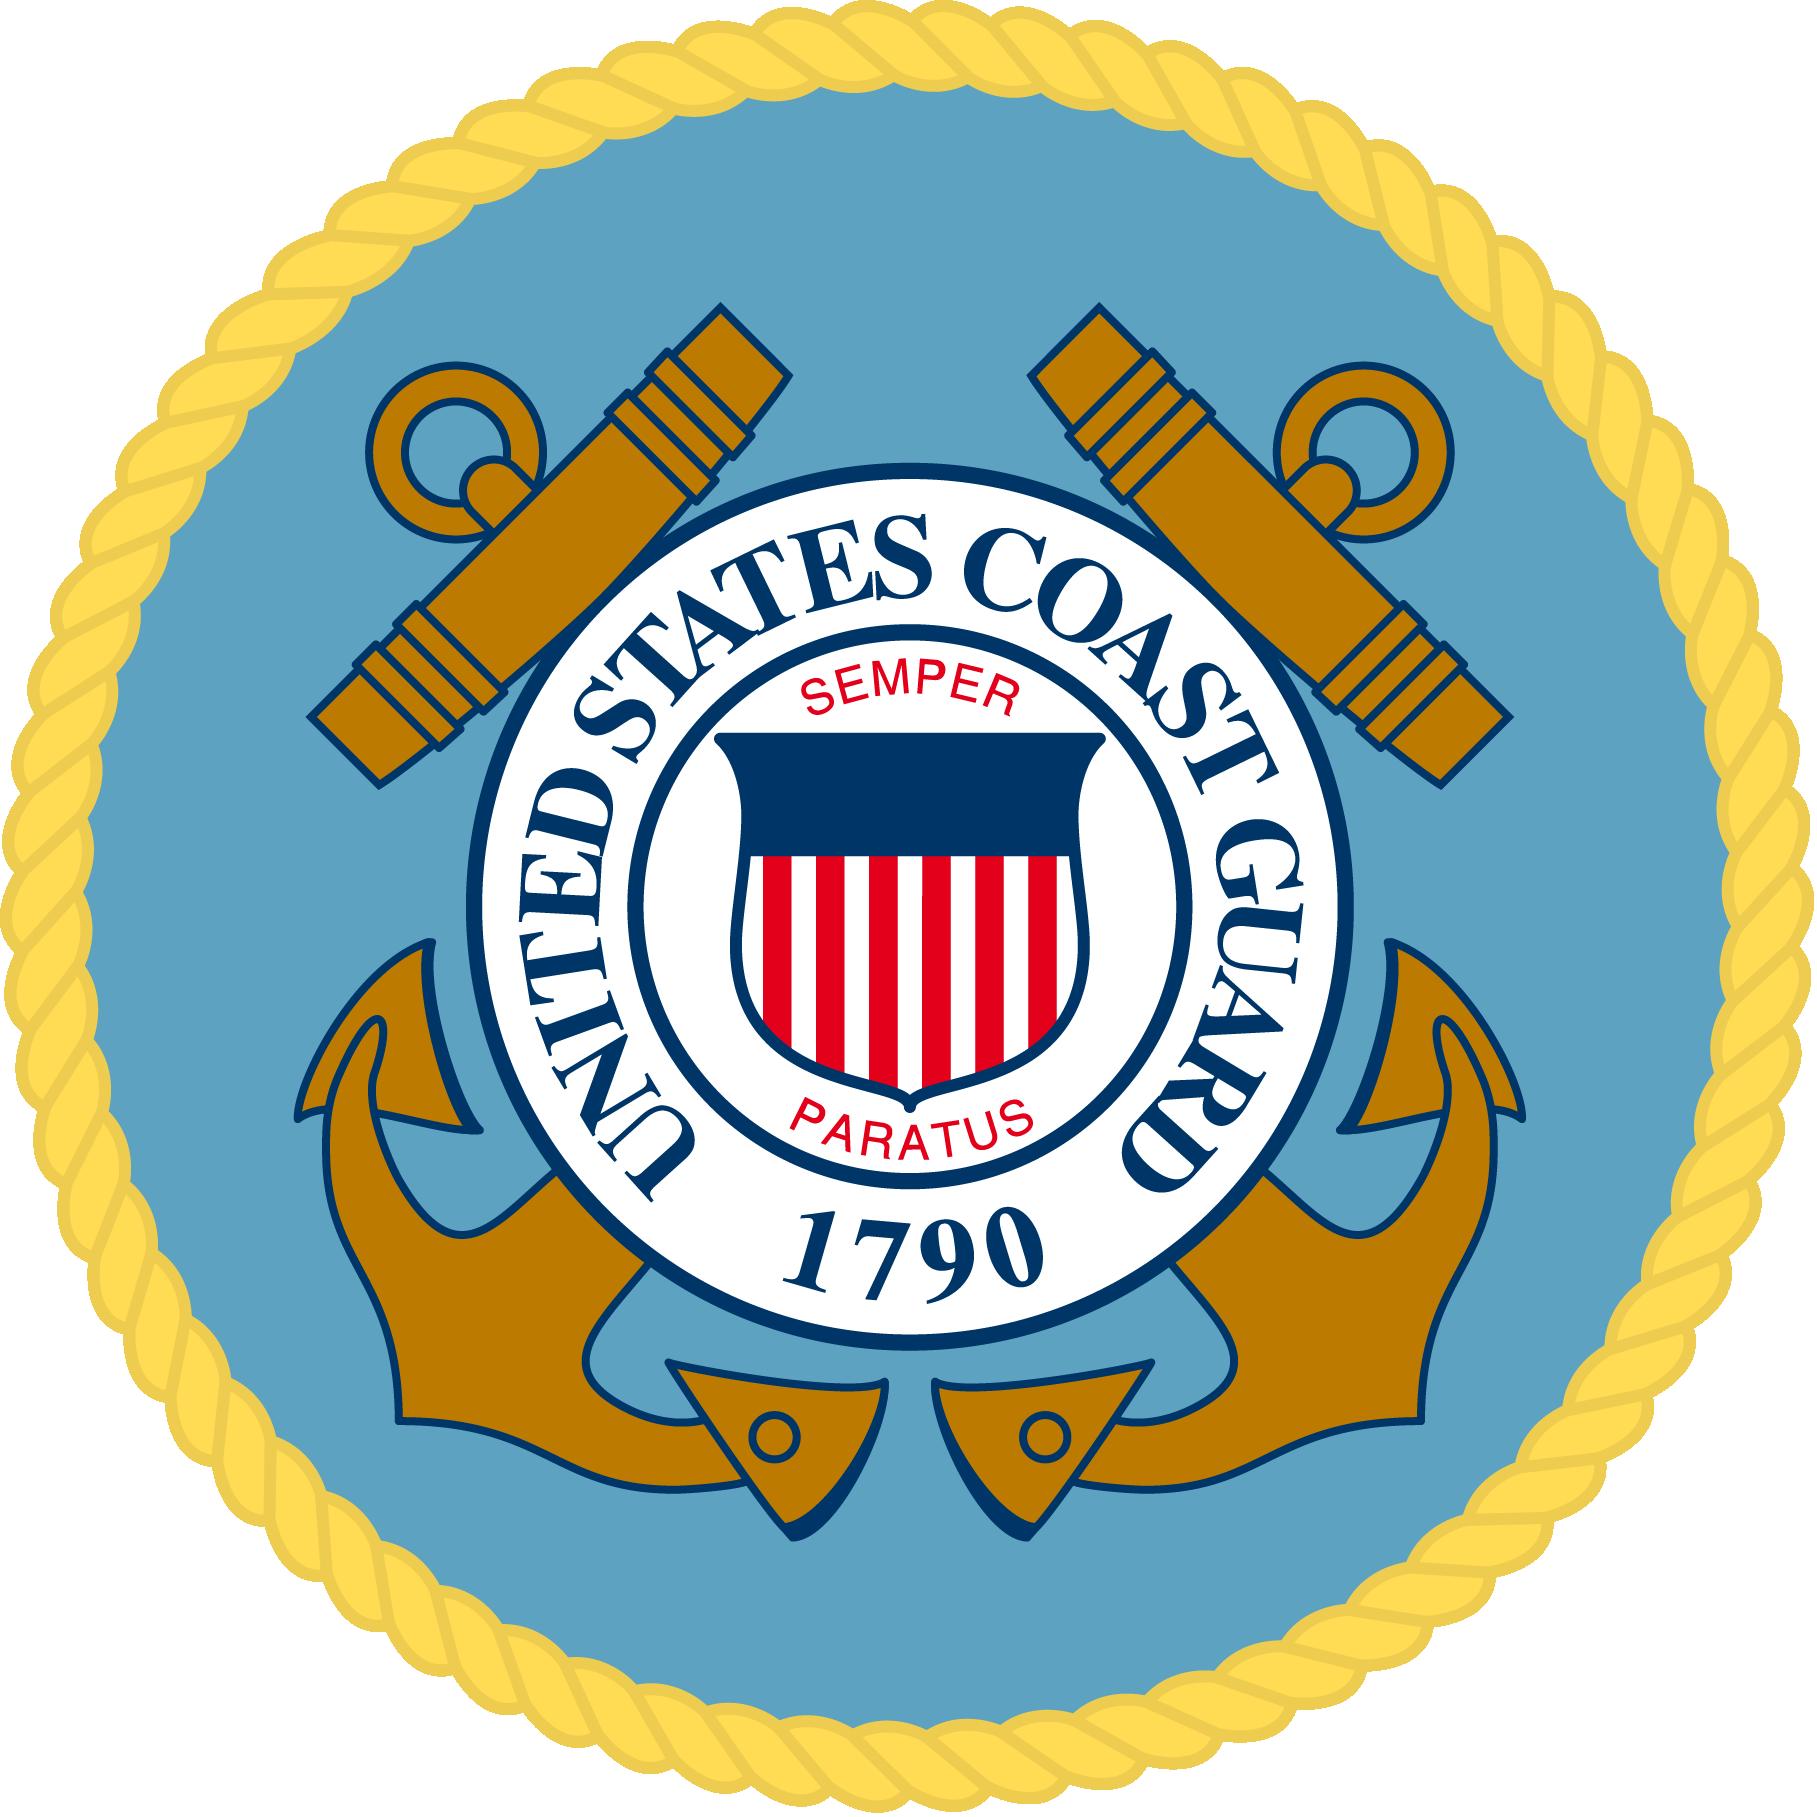 1817x1817 Dod Logos Us Army Mwr